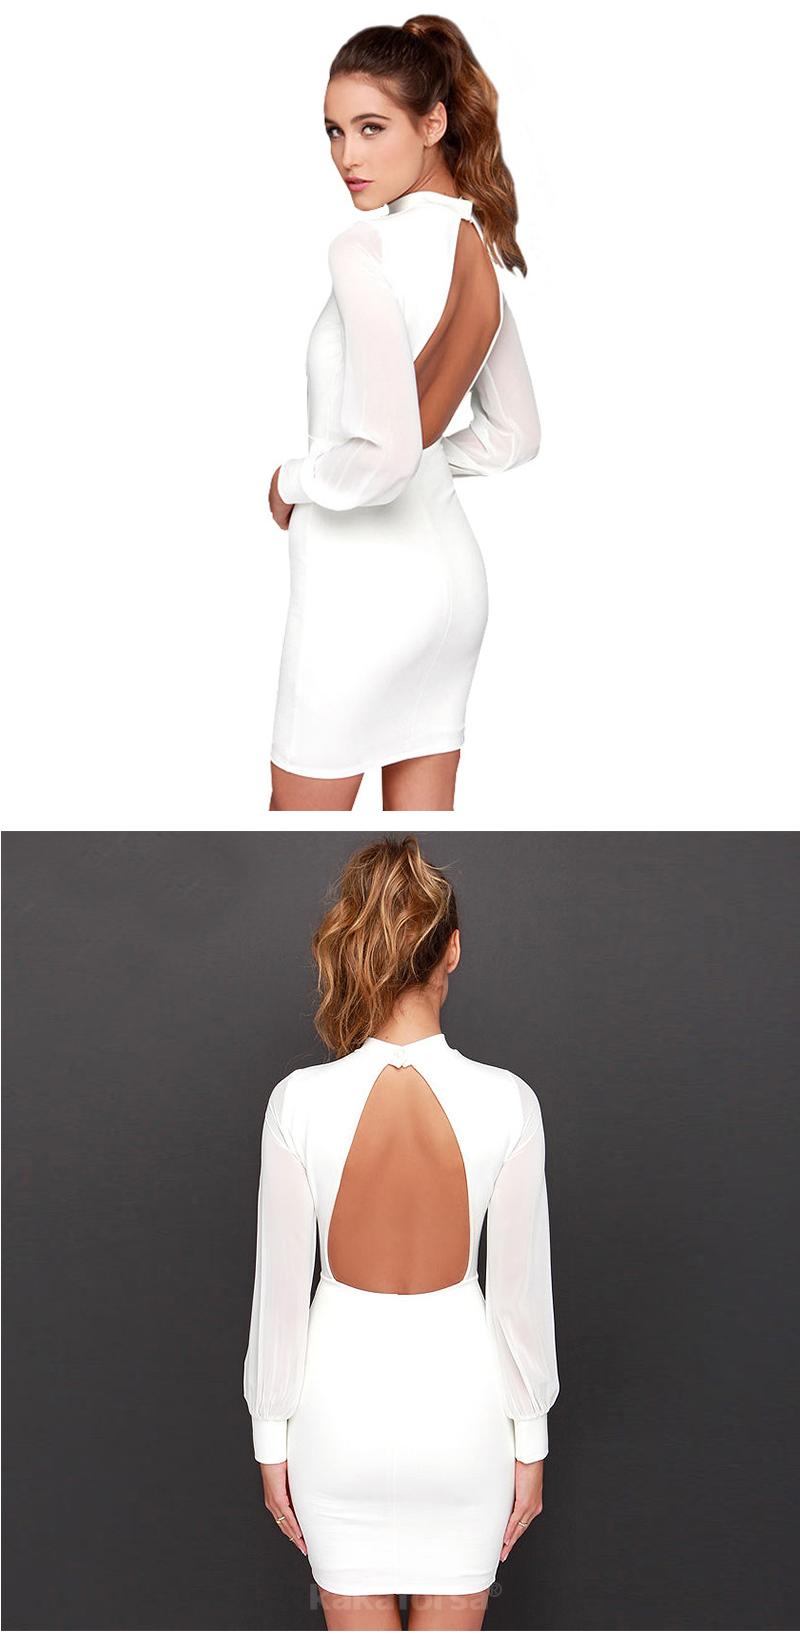 Kakaforsa Women Sexy Backless White Dress Casual Plus Size Slim Fit Bodycon Short Dress Long Sleeve O-Neck Mini Party Dresses 13